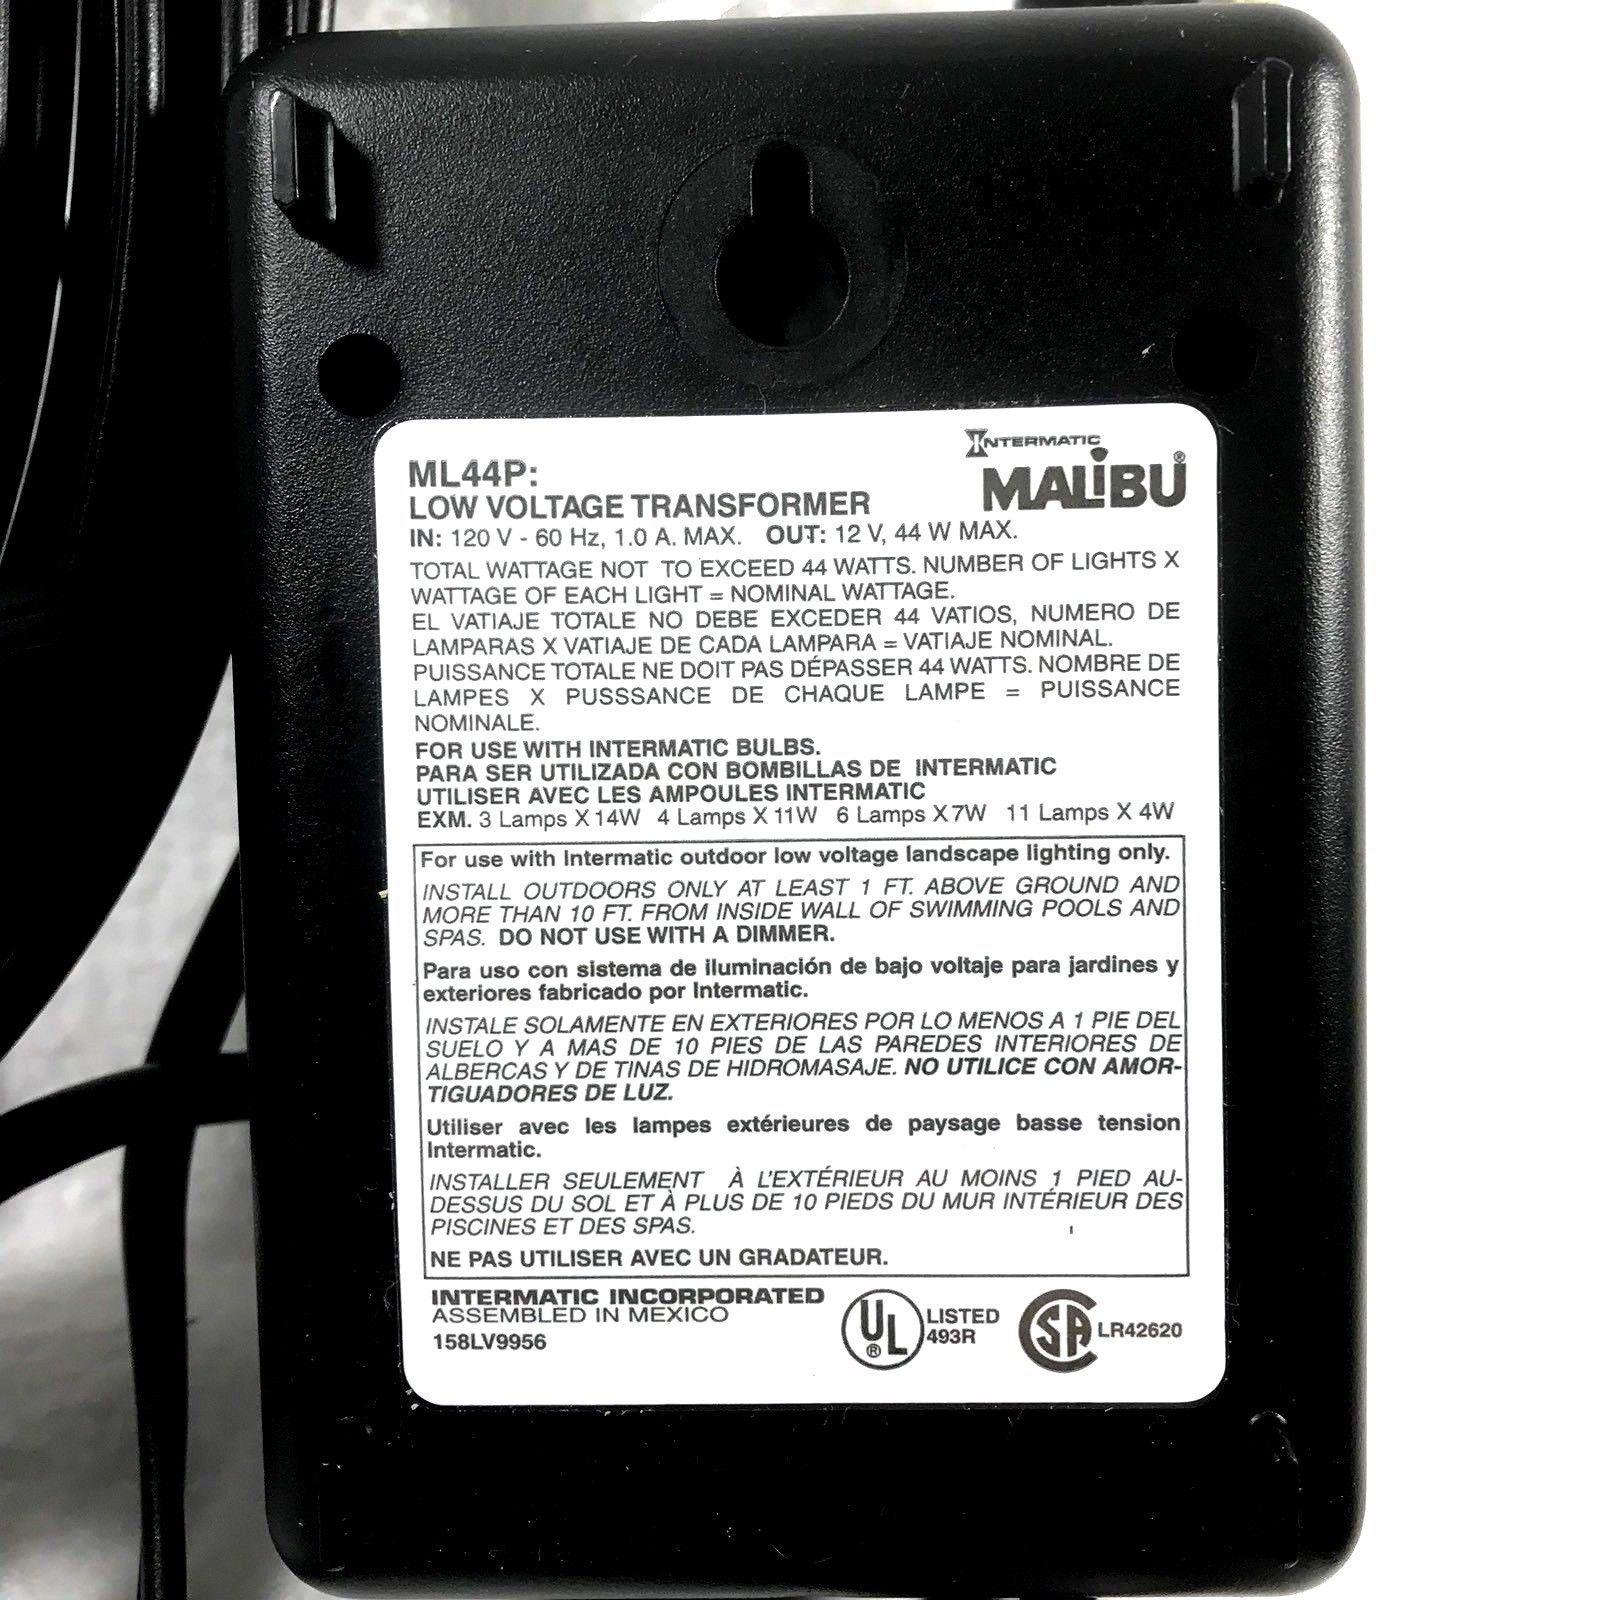 Malibu Low Voltage Transformer Wiring Solutions Lighting Diagram 44 Watt Ml44p And 13 Similar Items Outdoor Image